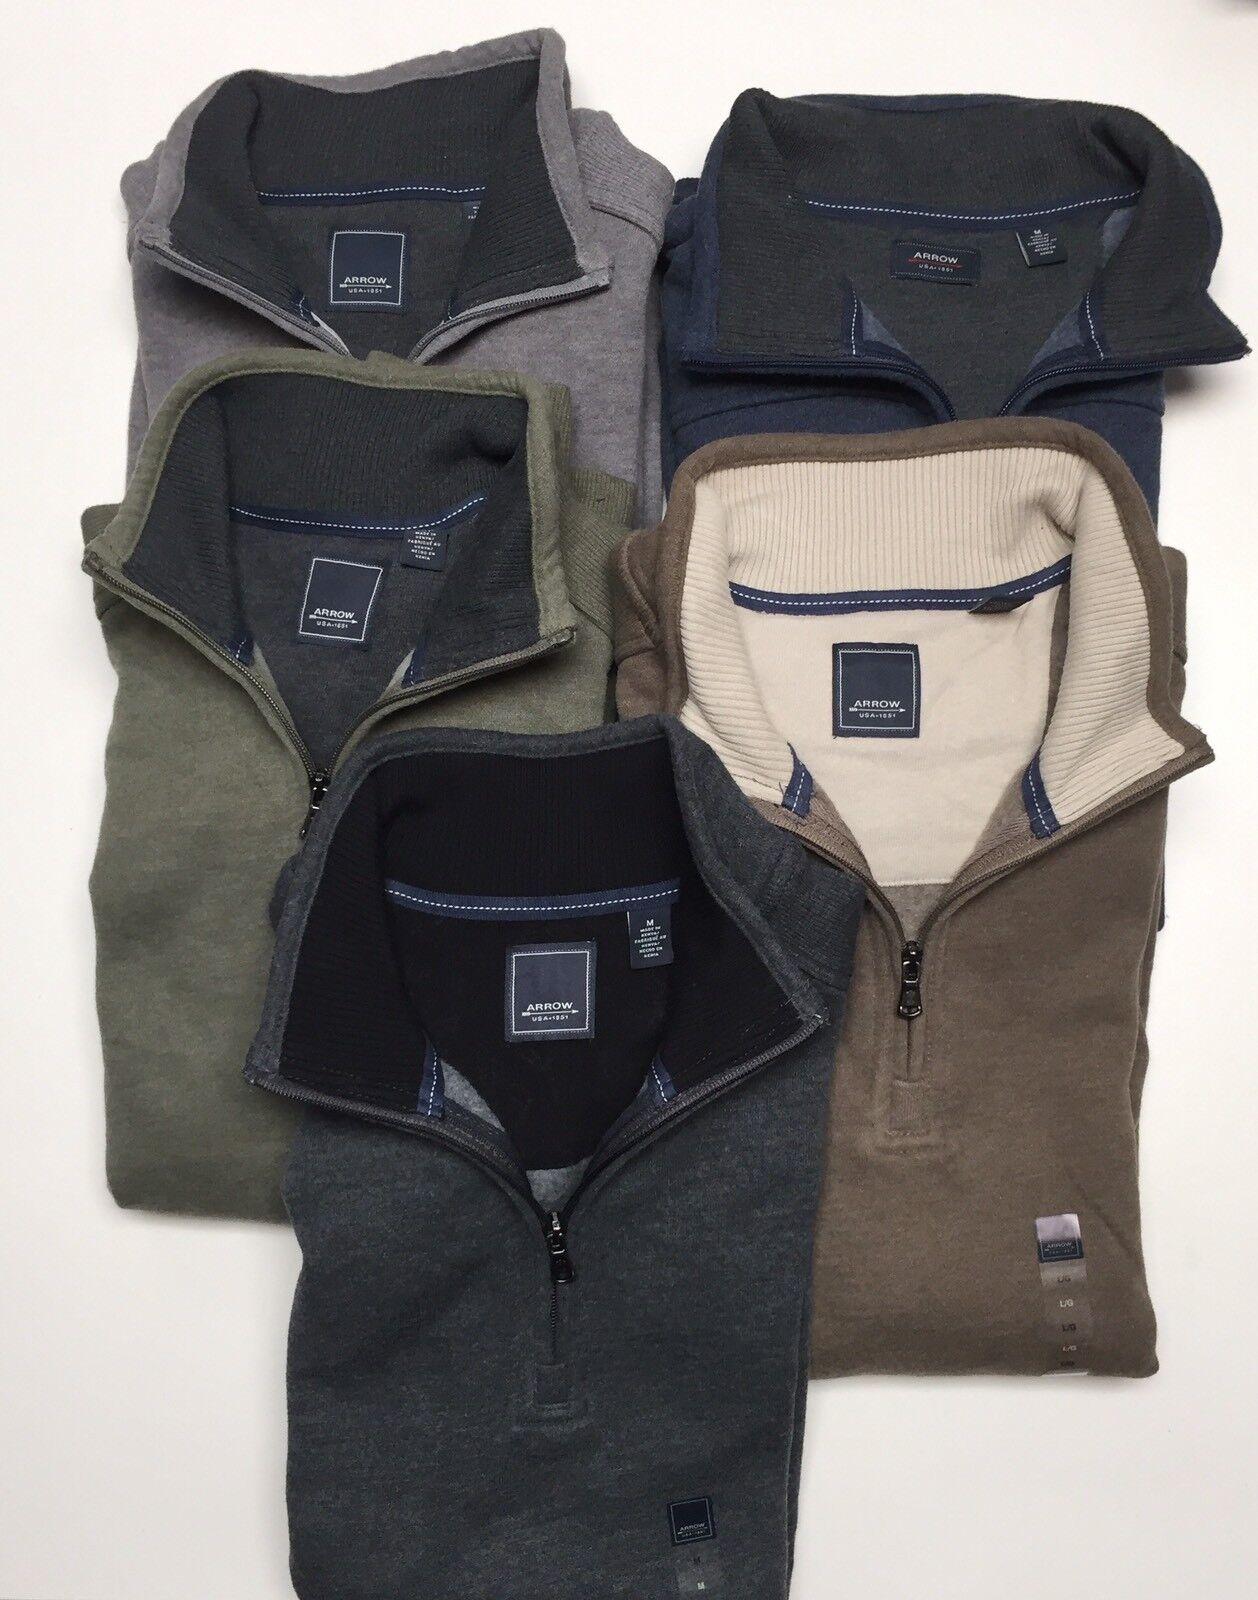 Arrow Men'S 1/4 Zipper Cotton-Poly Fleece Jumper Top S-M-L-XXL-4XL-5XL NWT